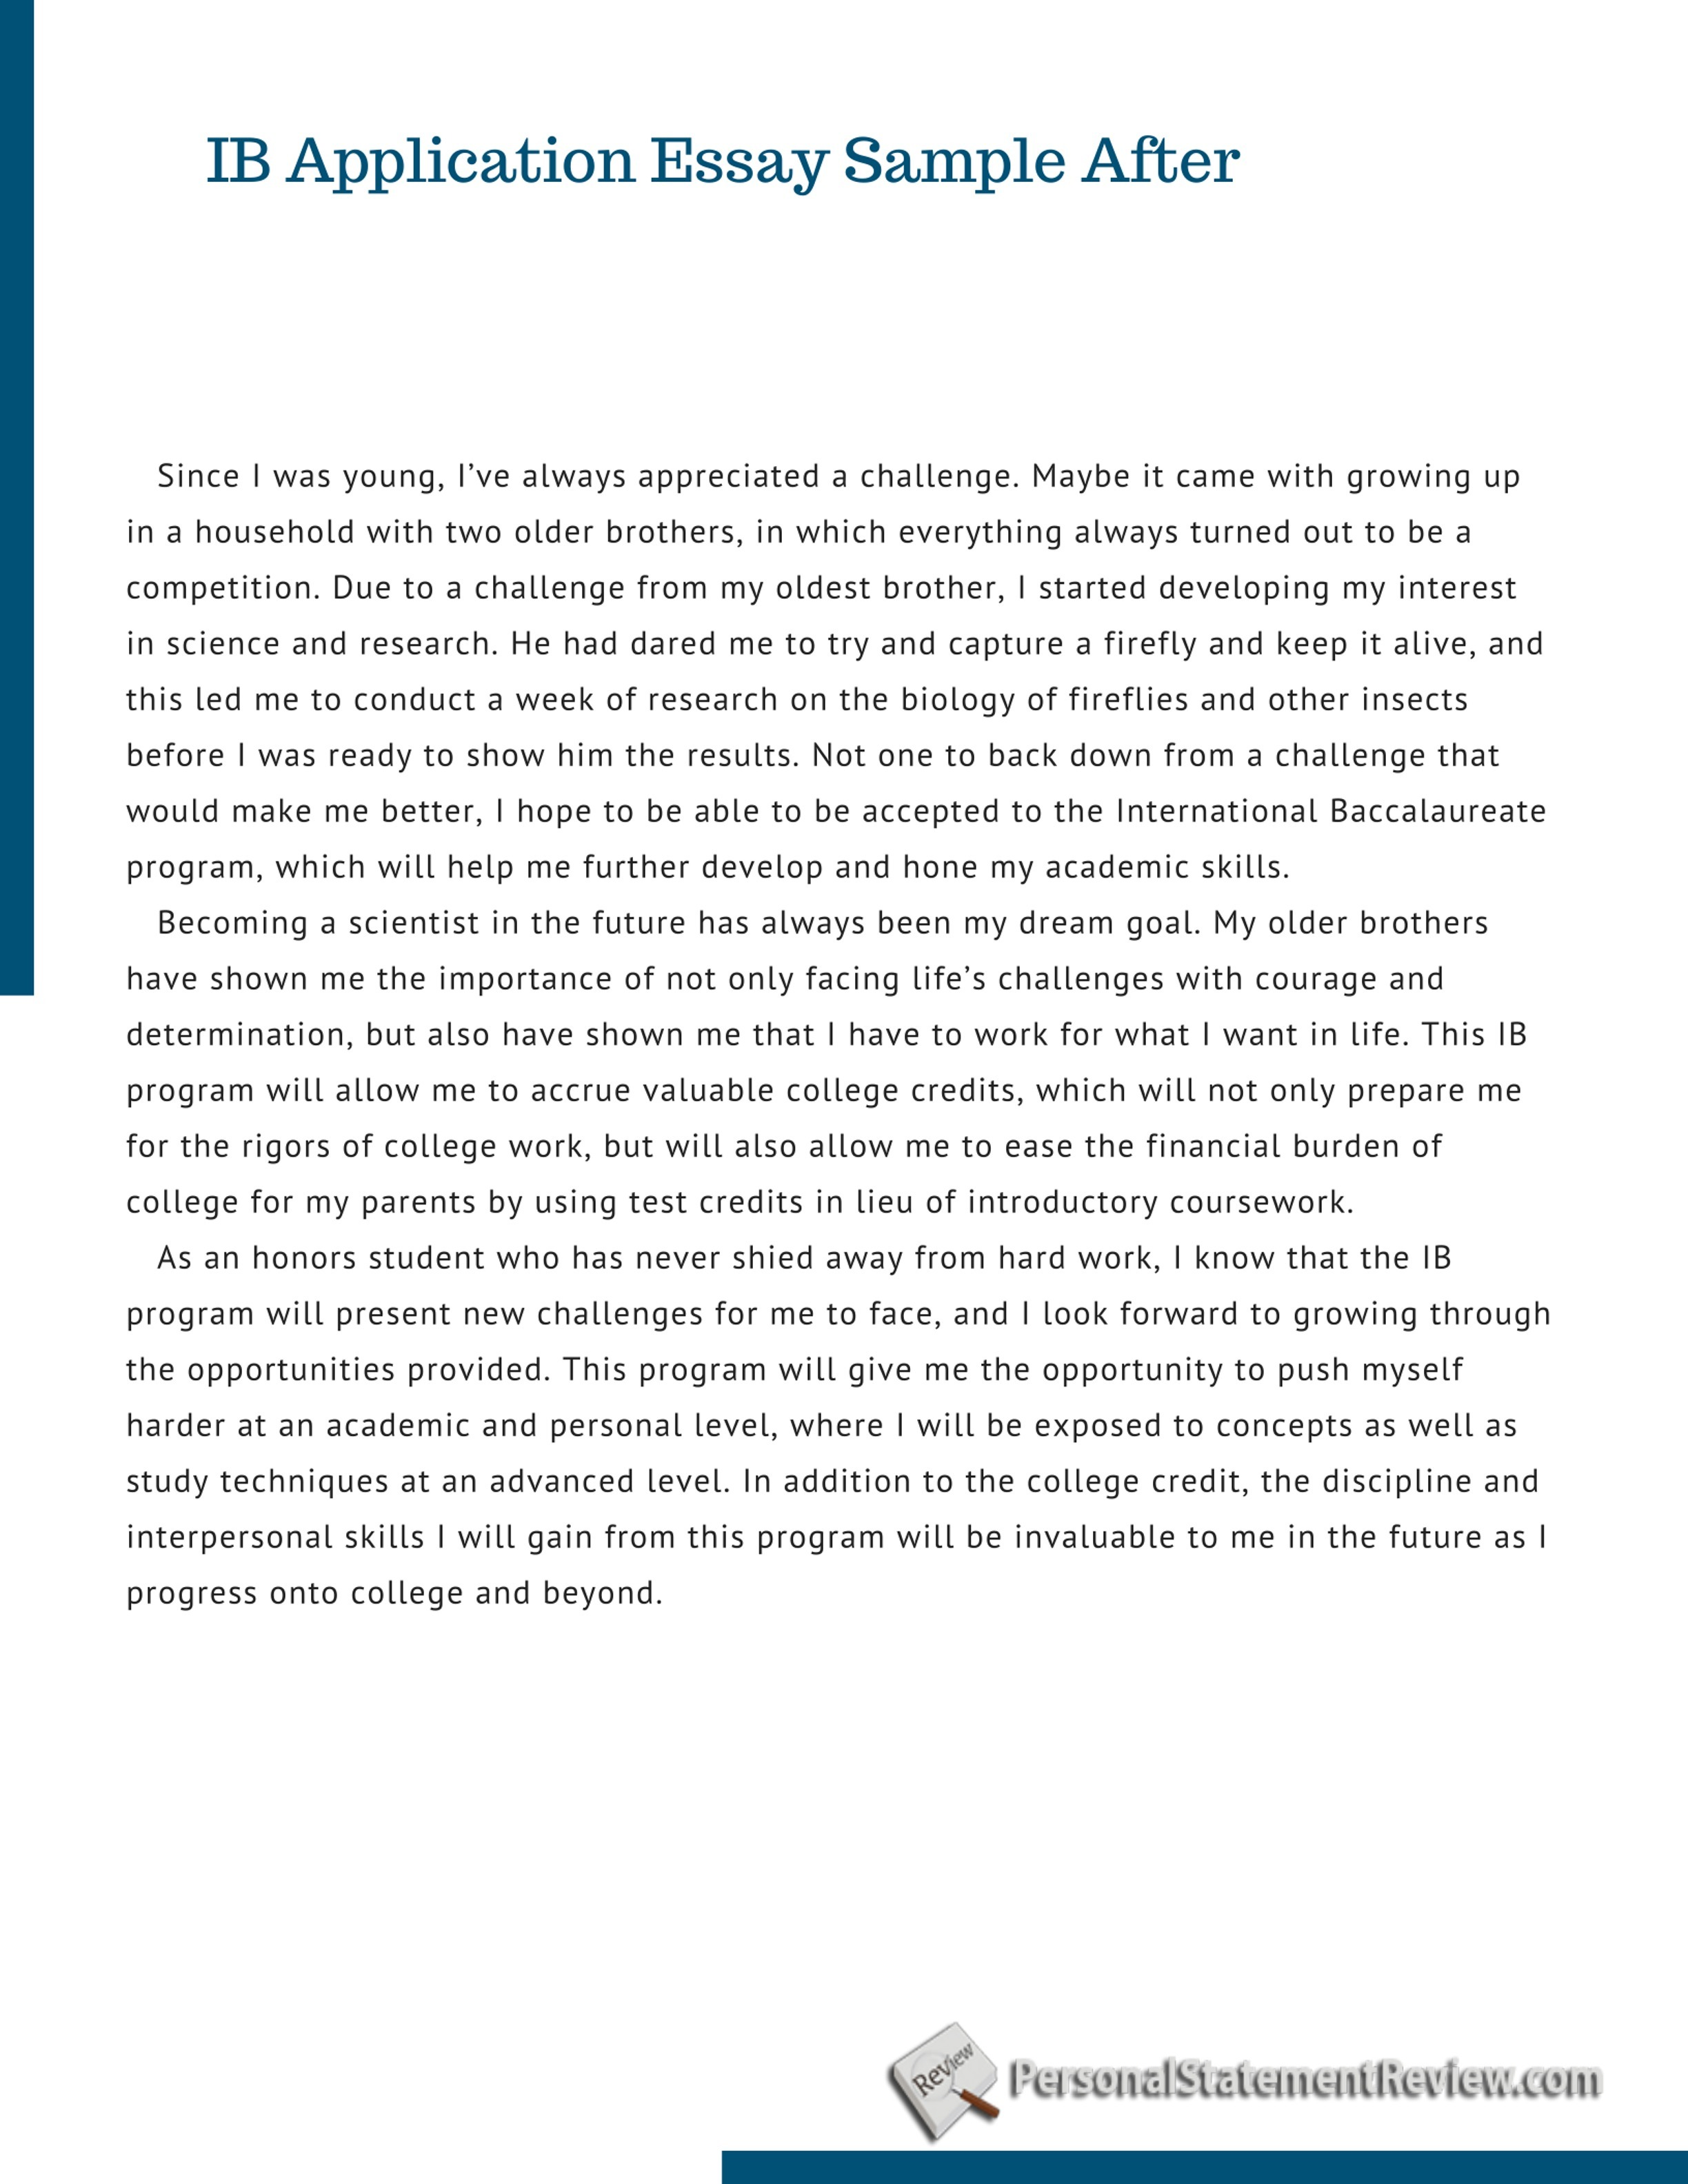 International business admission essay